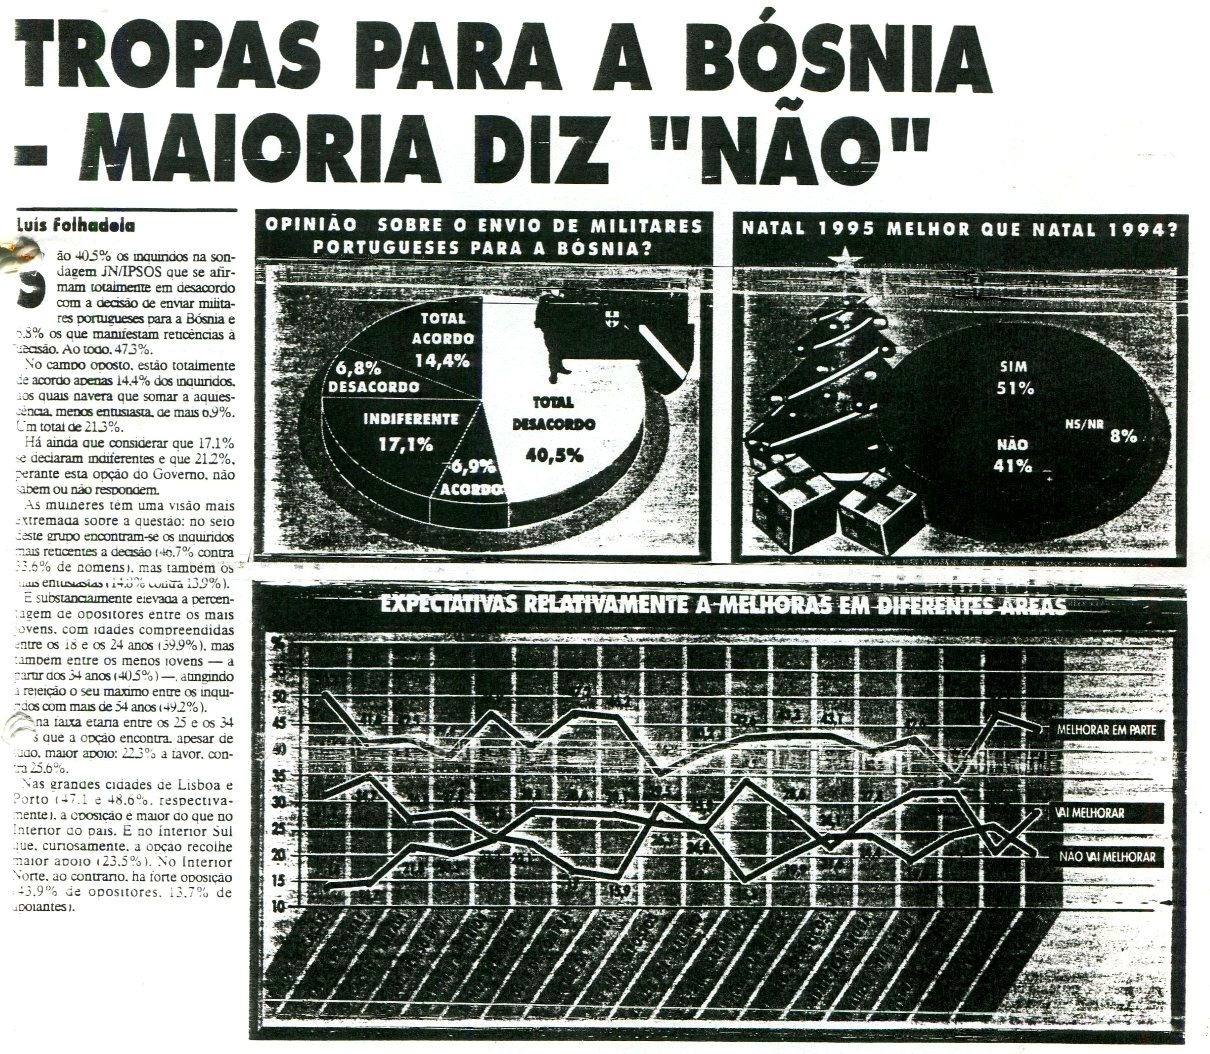 11DEZ1995 - Jornal de Noticias